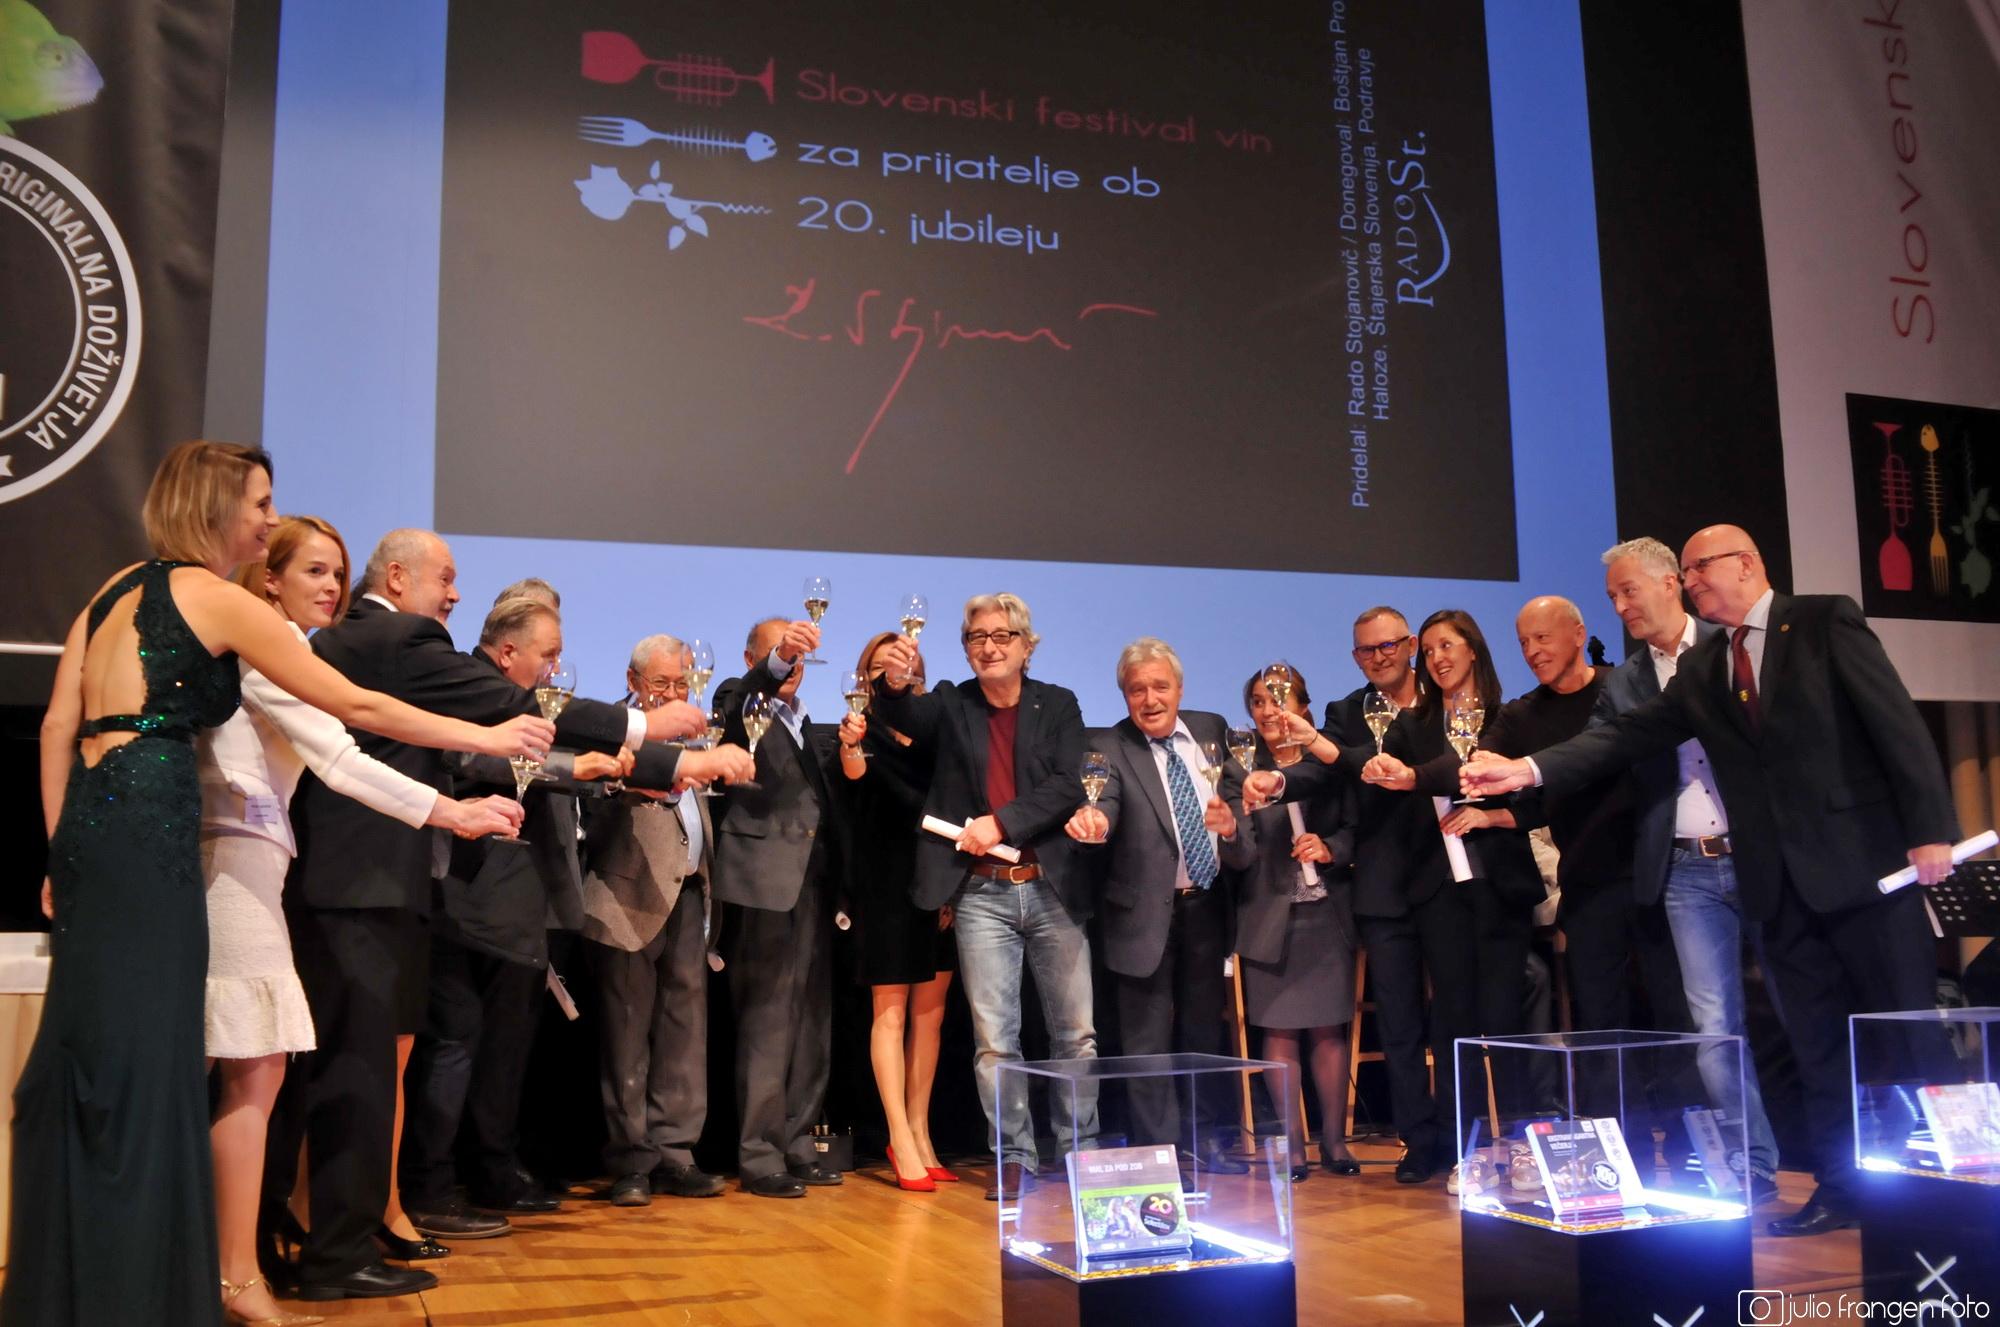 20. Jubilarni Slovenski festival vina oborio sve rekorde posjećenosti!